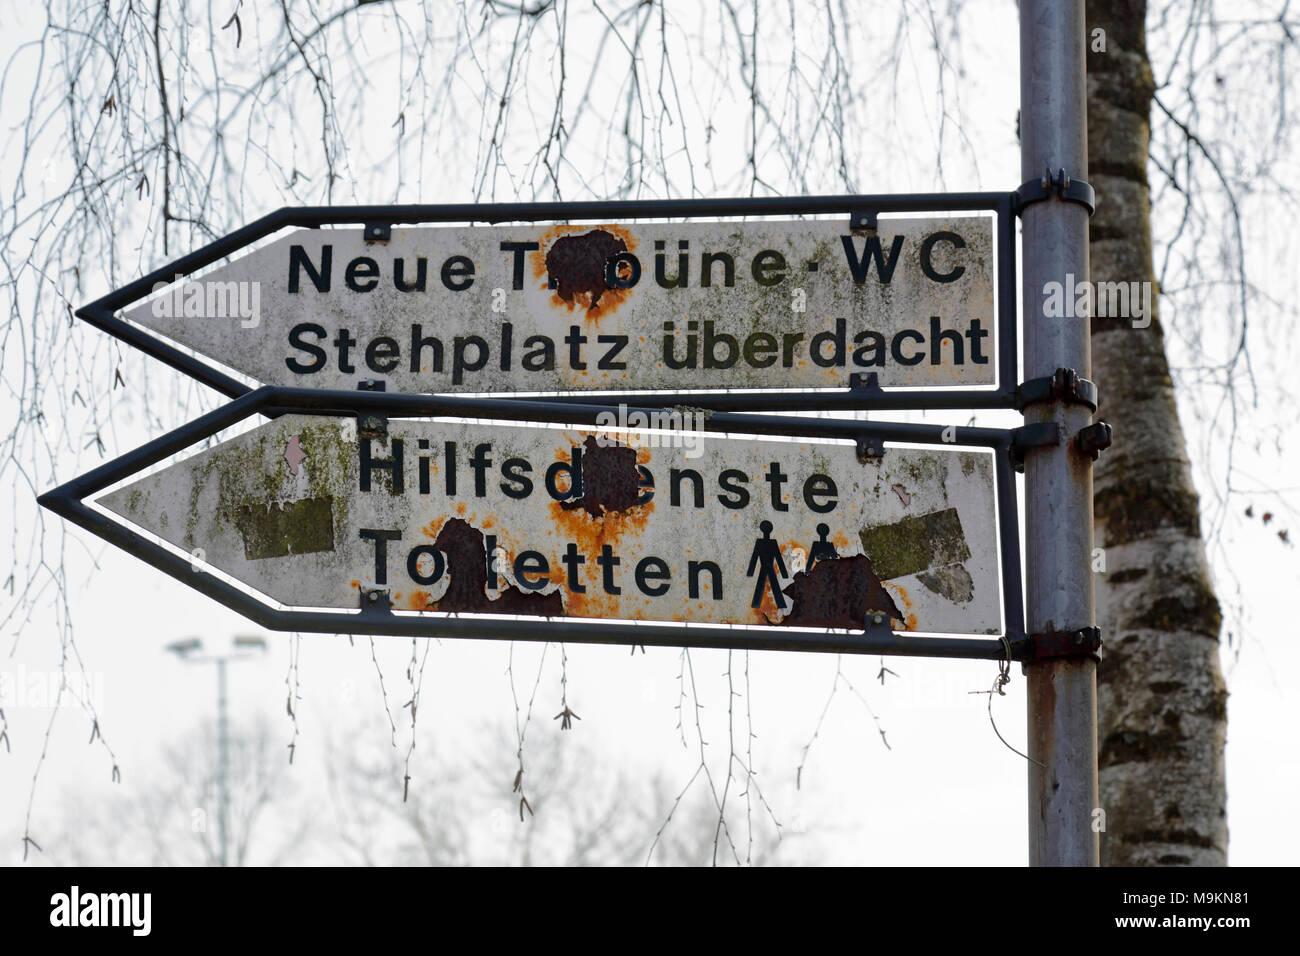 sports, football, Regional League West, 2017/2018, Grotenburg Stadium in Krefeld-Bockum, Lower Rhine, North Rhine-Westphalia, home ground of KFC Uerdingen 05, ramshackle, dilapidated, in need of renovation, oxidated signs and guideposts at the stadium - Stock Image